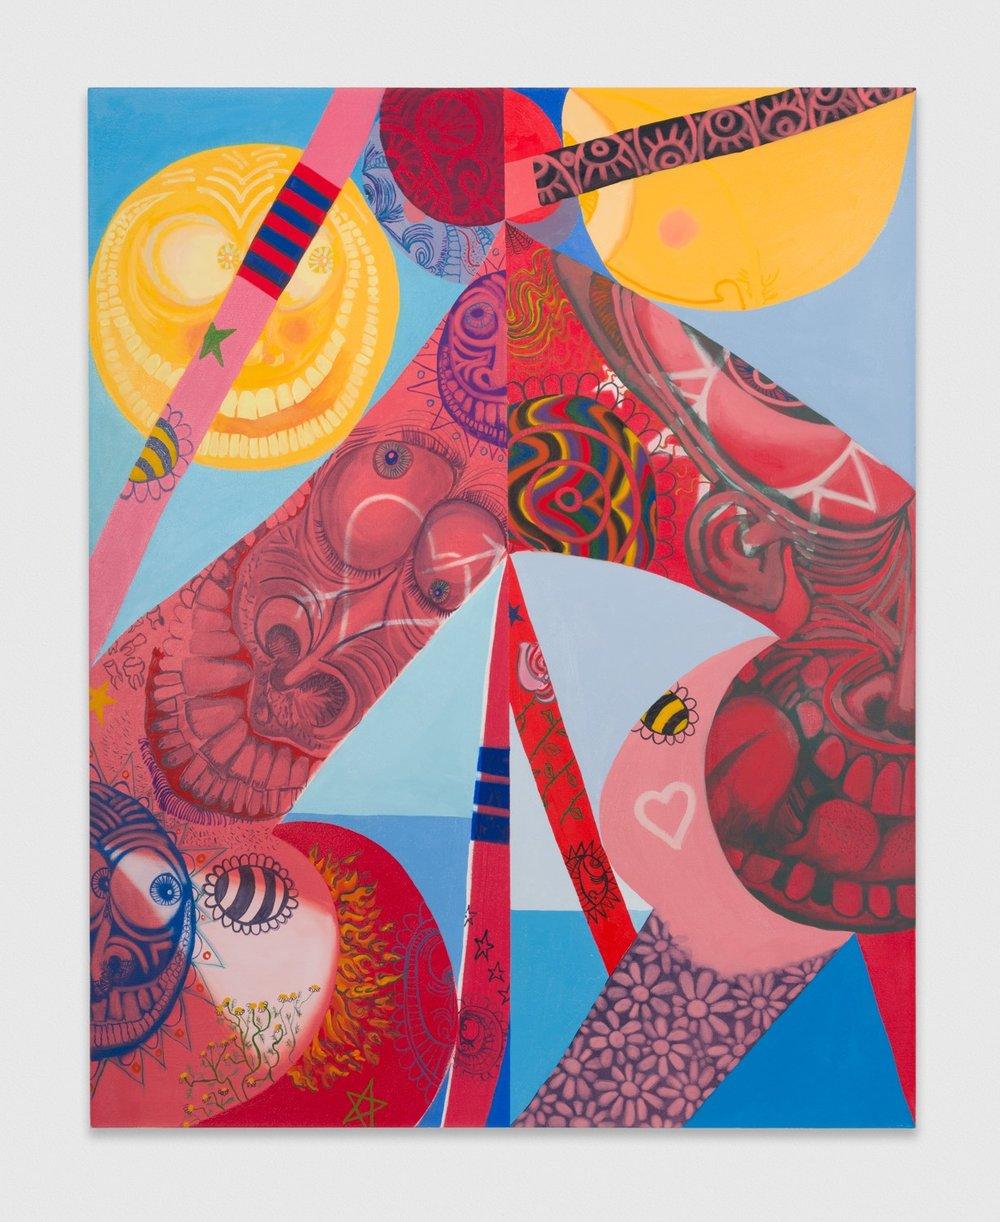 PeterFagundo  In Dreams  2018 Oil on canvas 60h x 48w in PF006